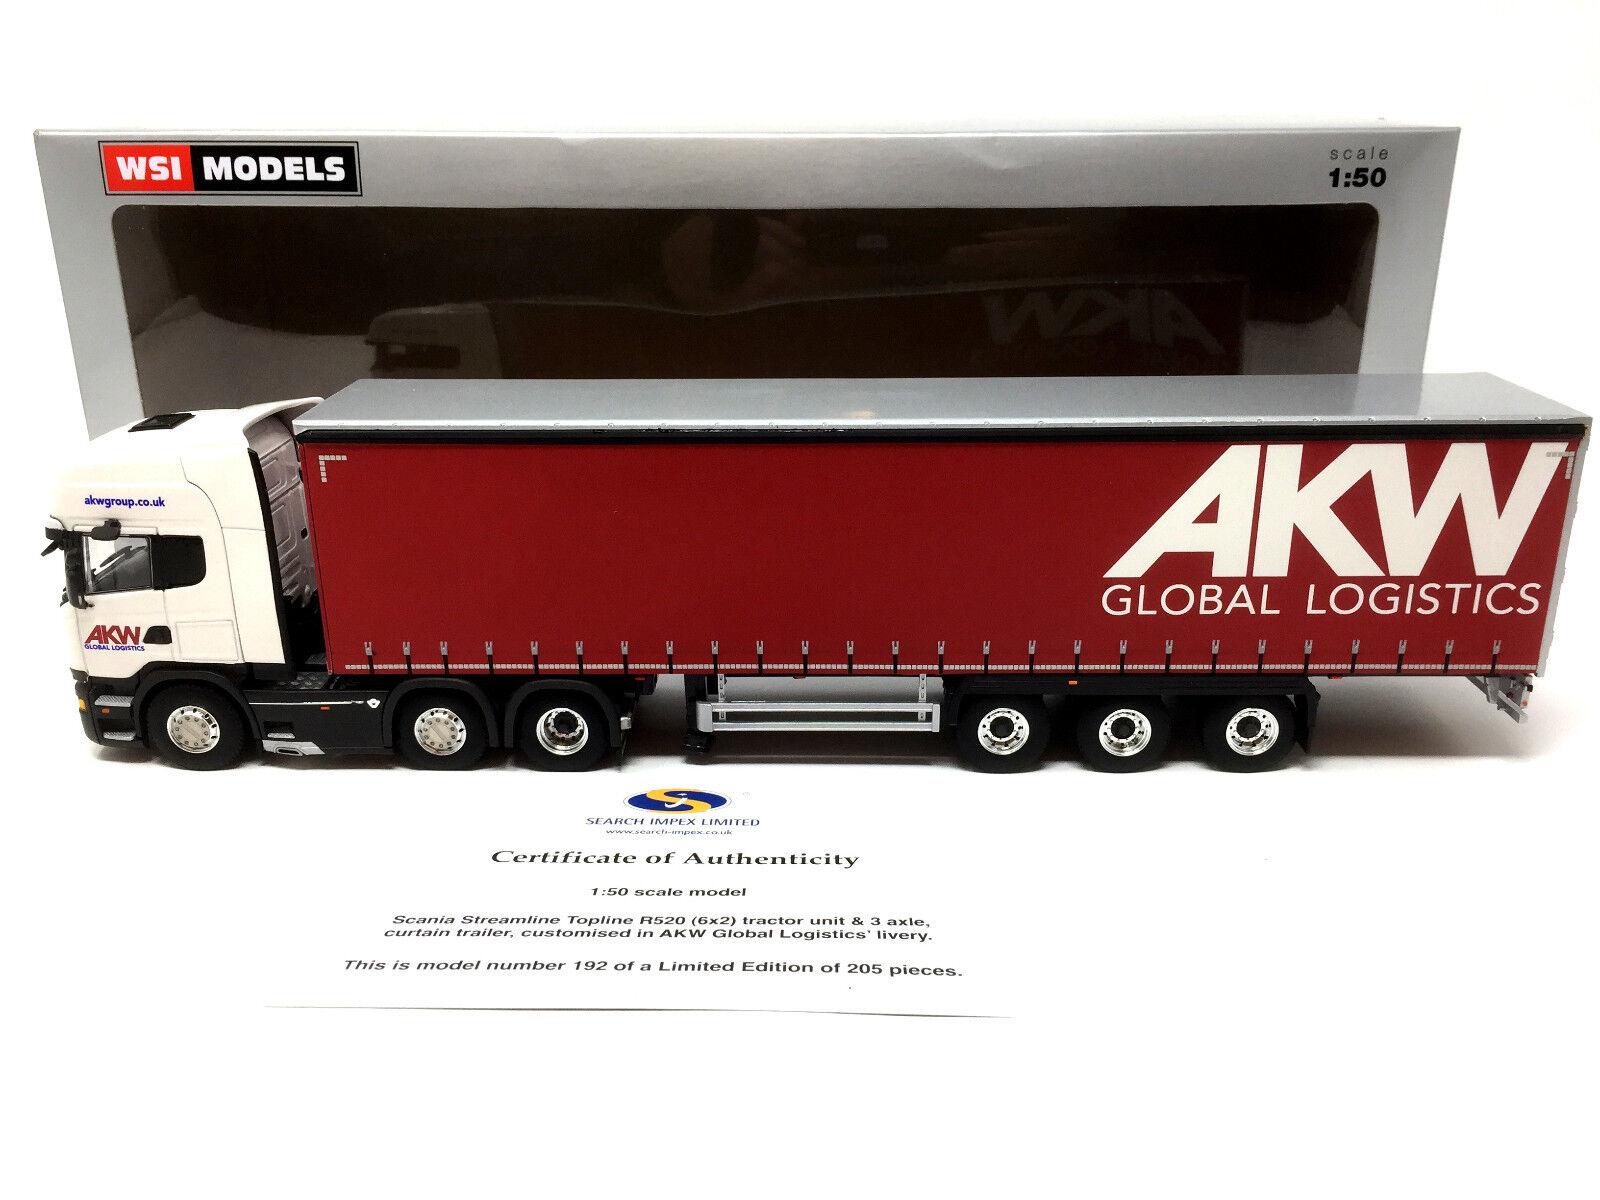 WSI Search Impex 1 50 50 50 Scania Streamline Topline R520 6x2 AKW Global Logistics fb7e12